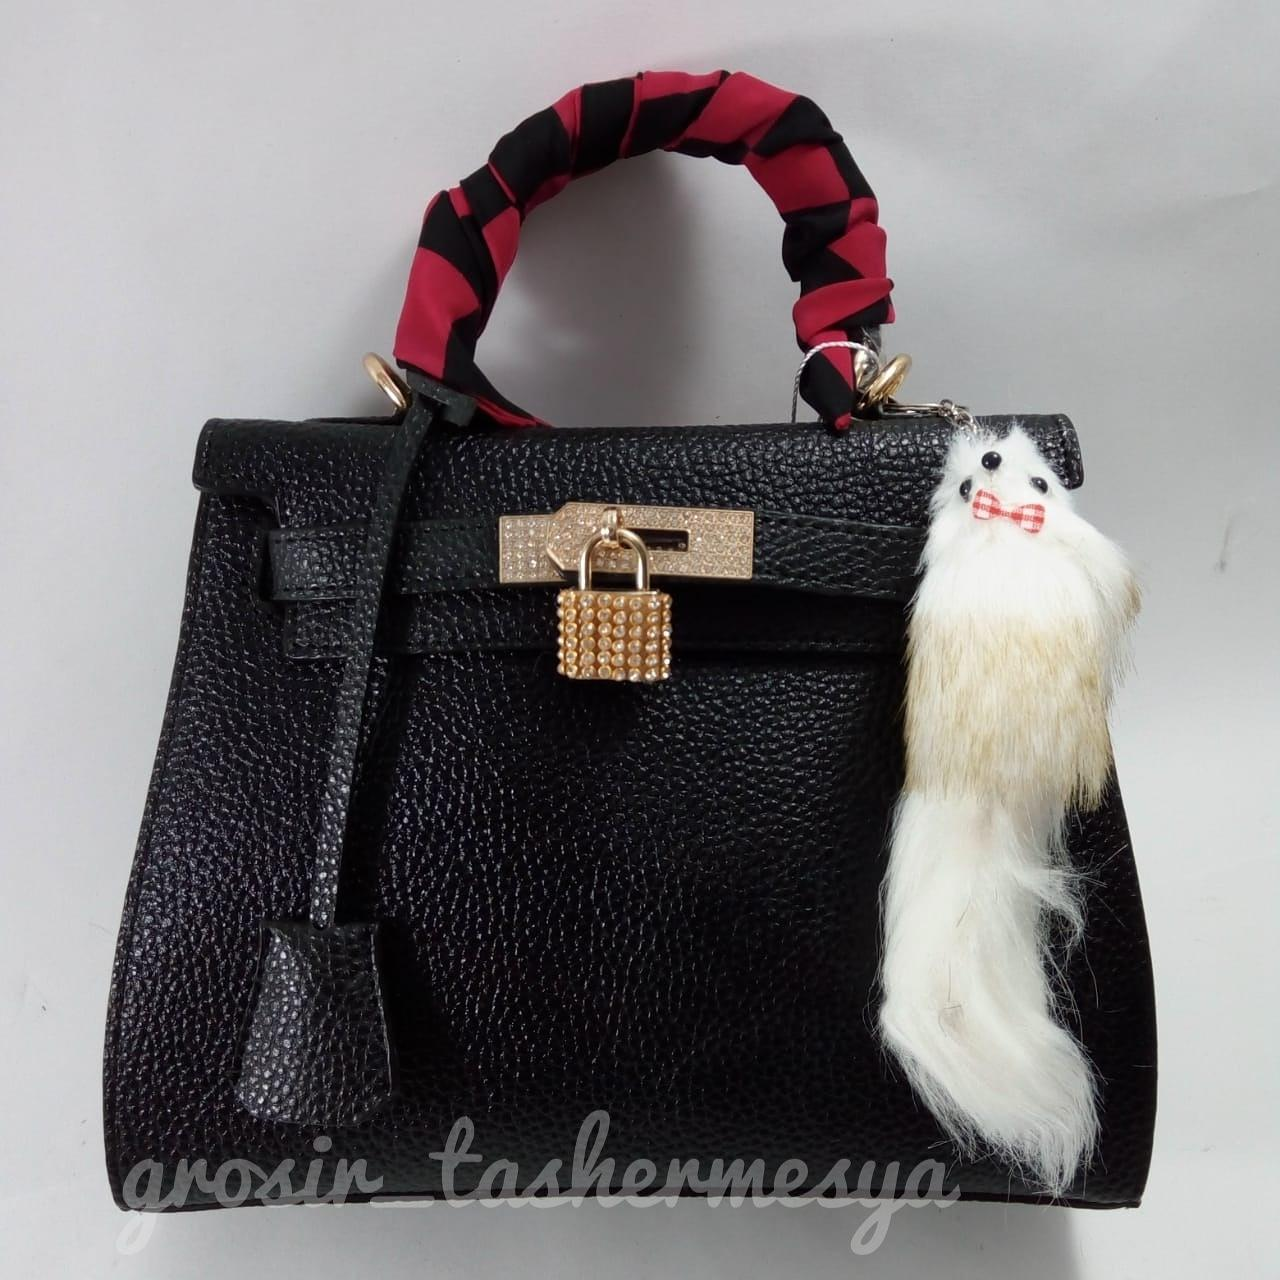 tas fashion SELEMPANG wanita import hermes kelly togo kulit jeruk gantungan bulu random dipadukan baju pesta kebaya modern casual